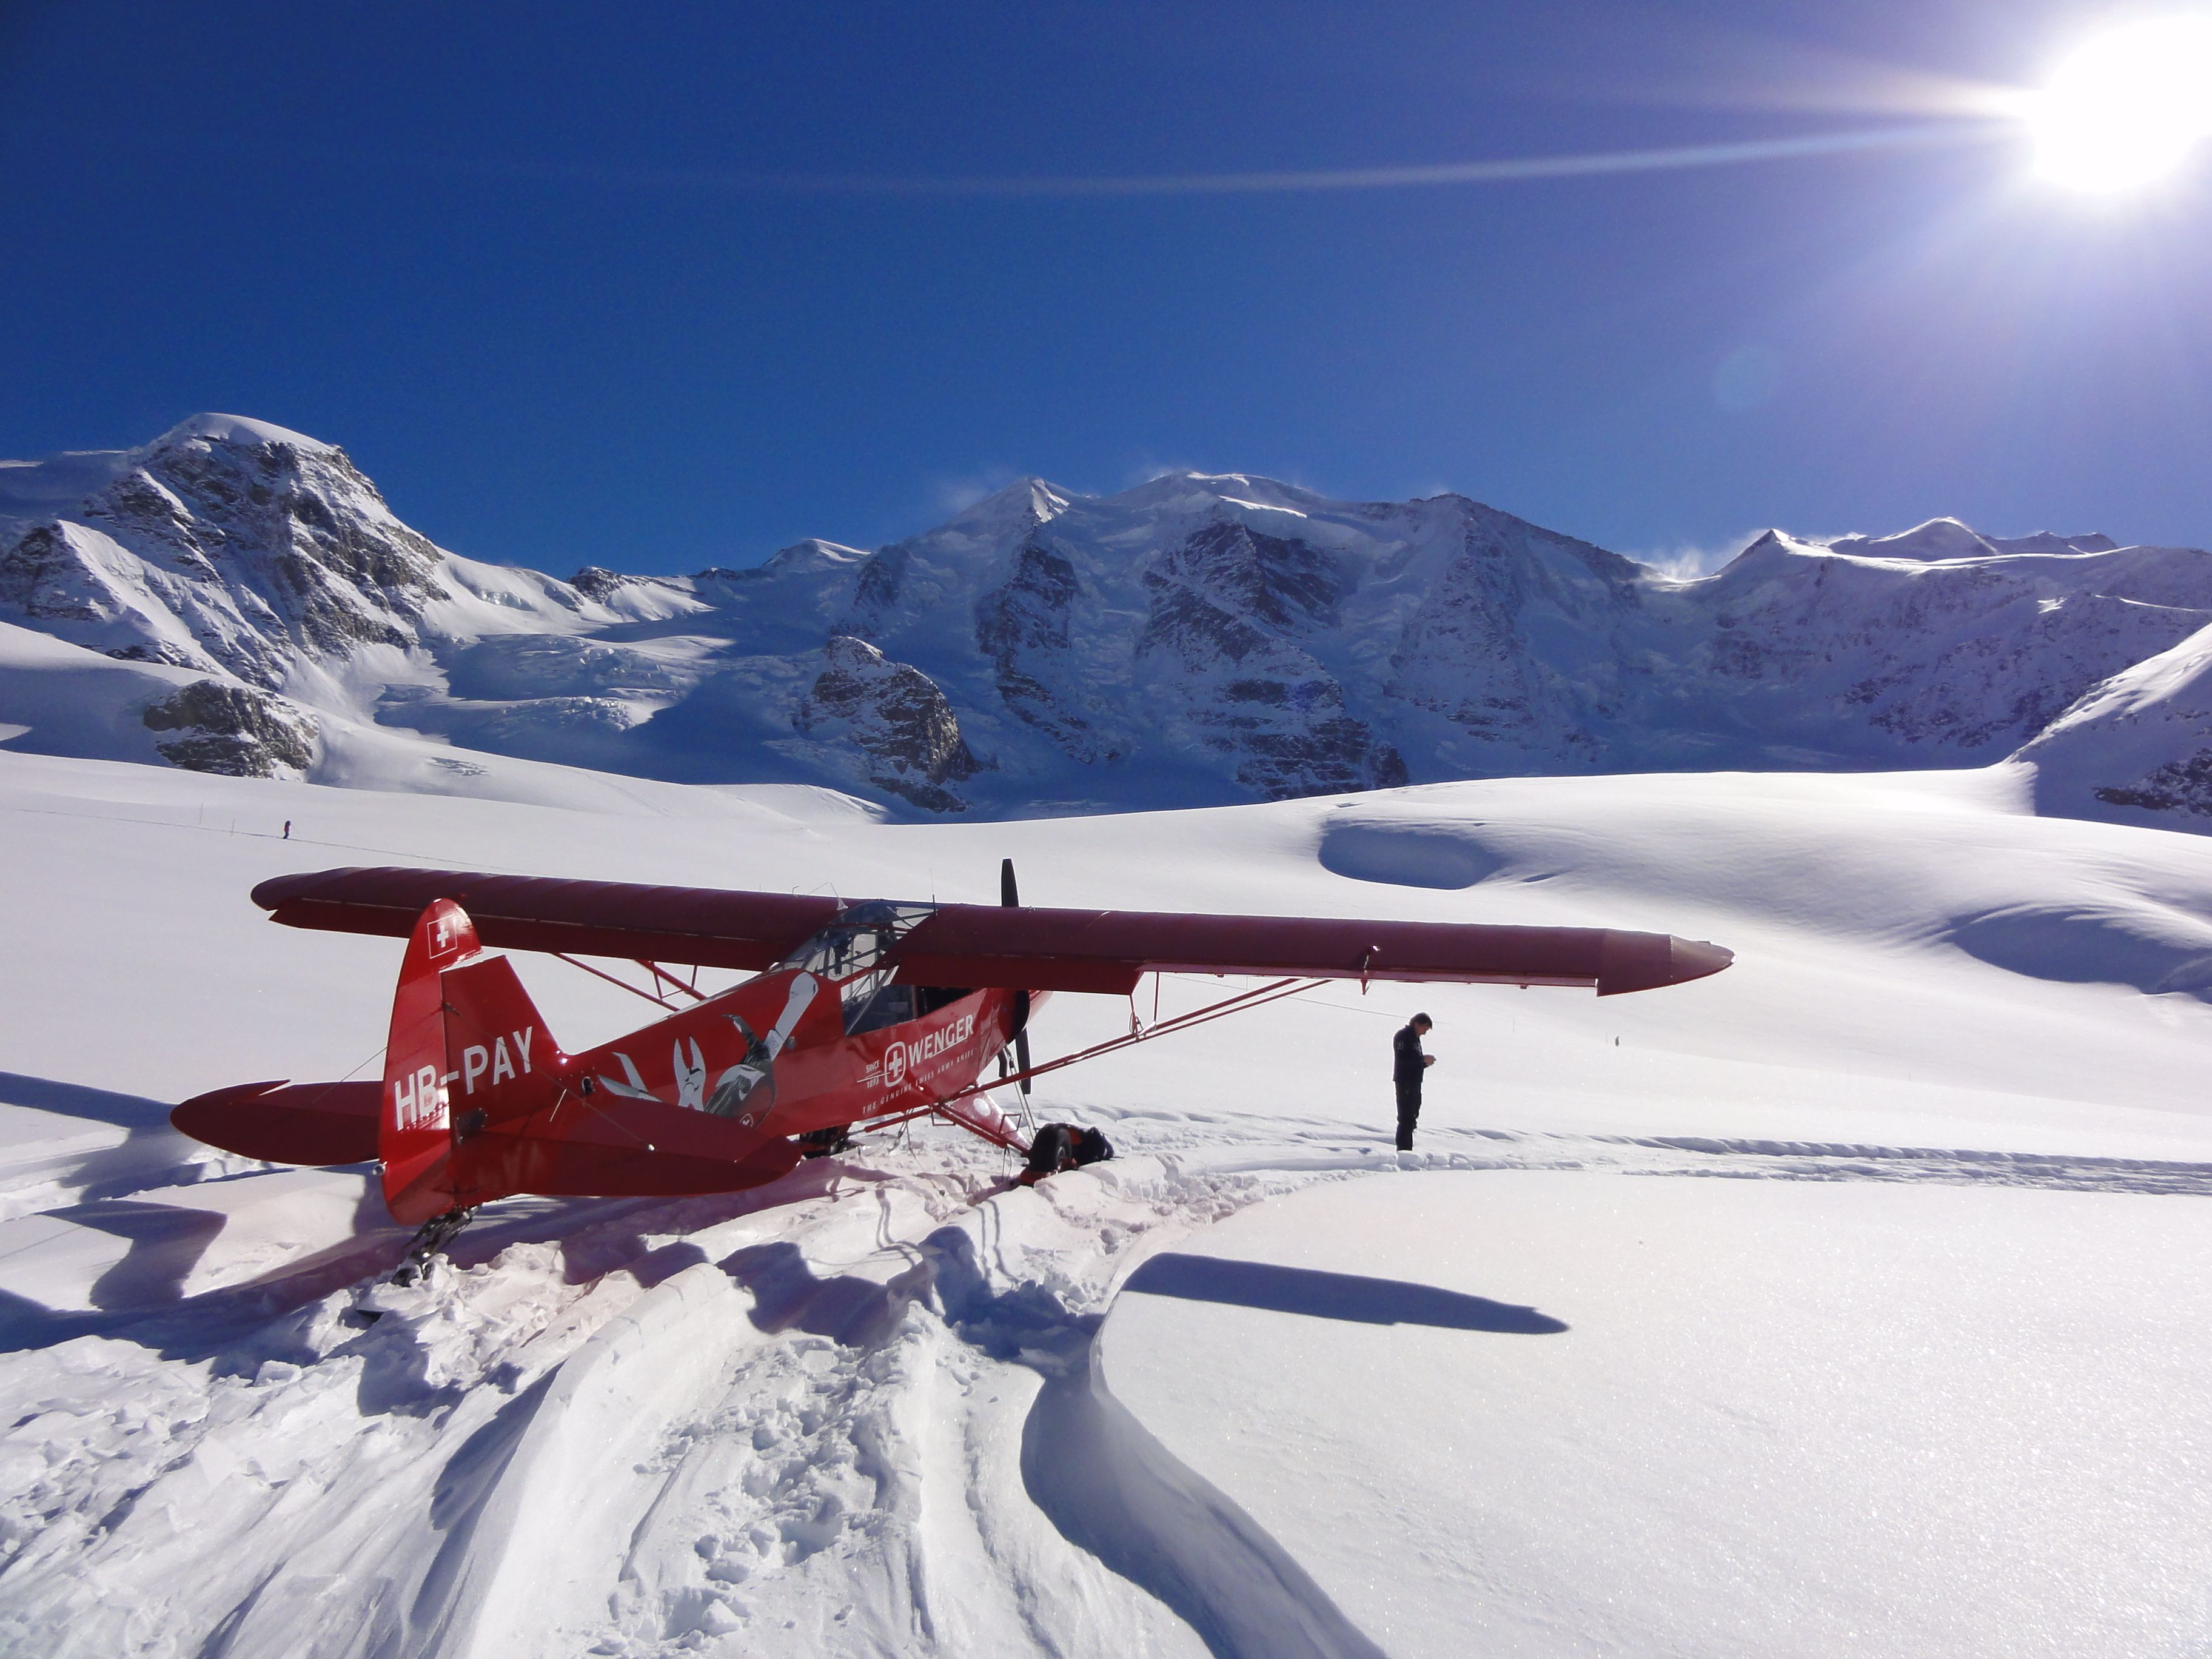 Piper cub on skis skiplane air planes pinterest